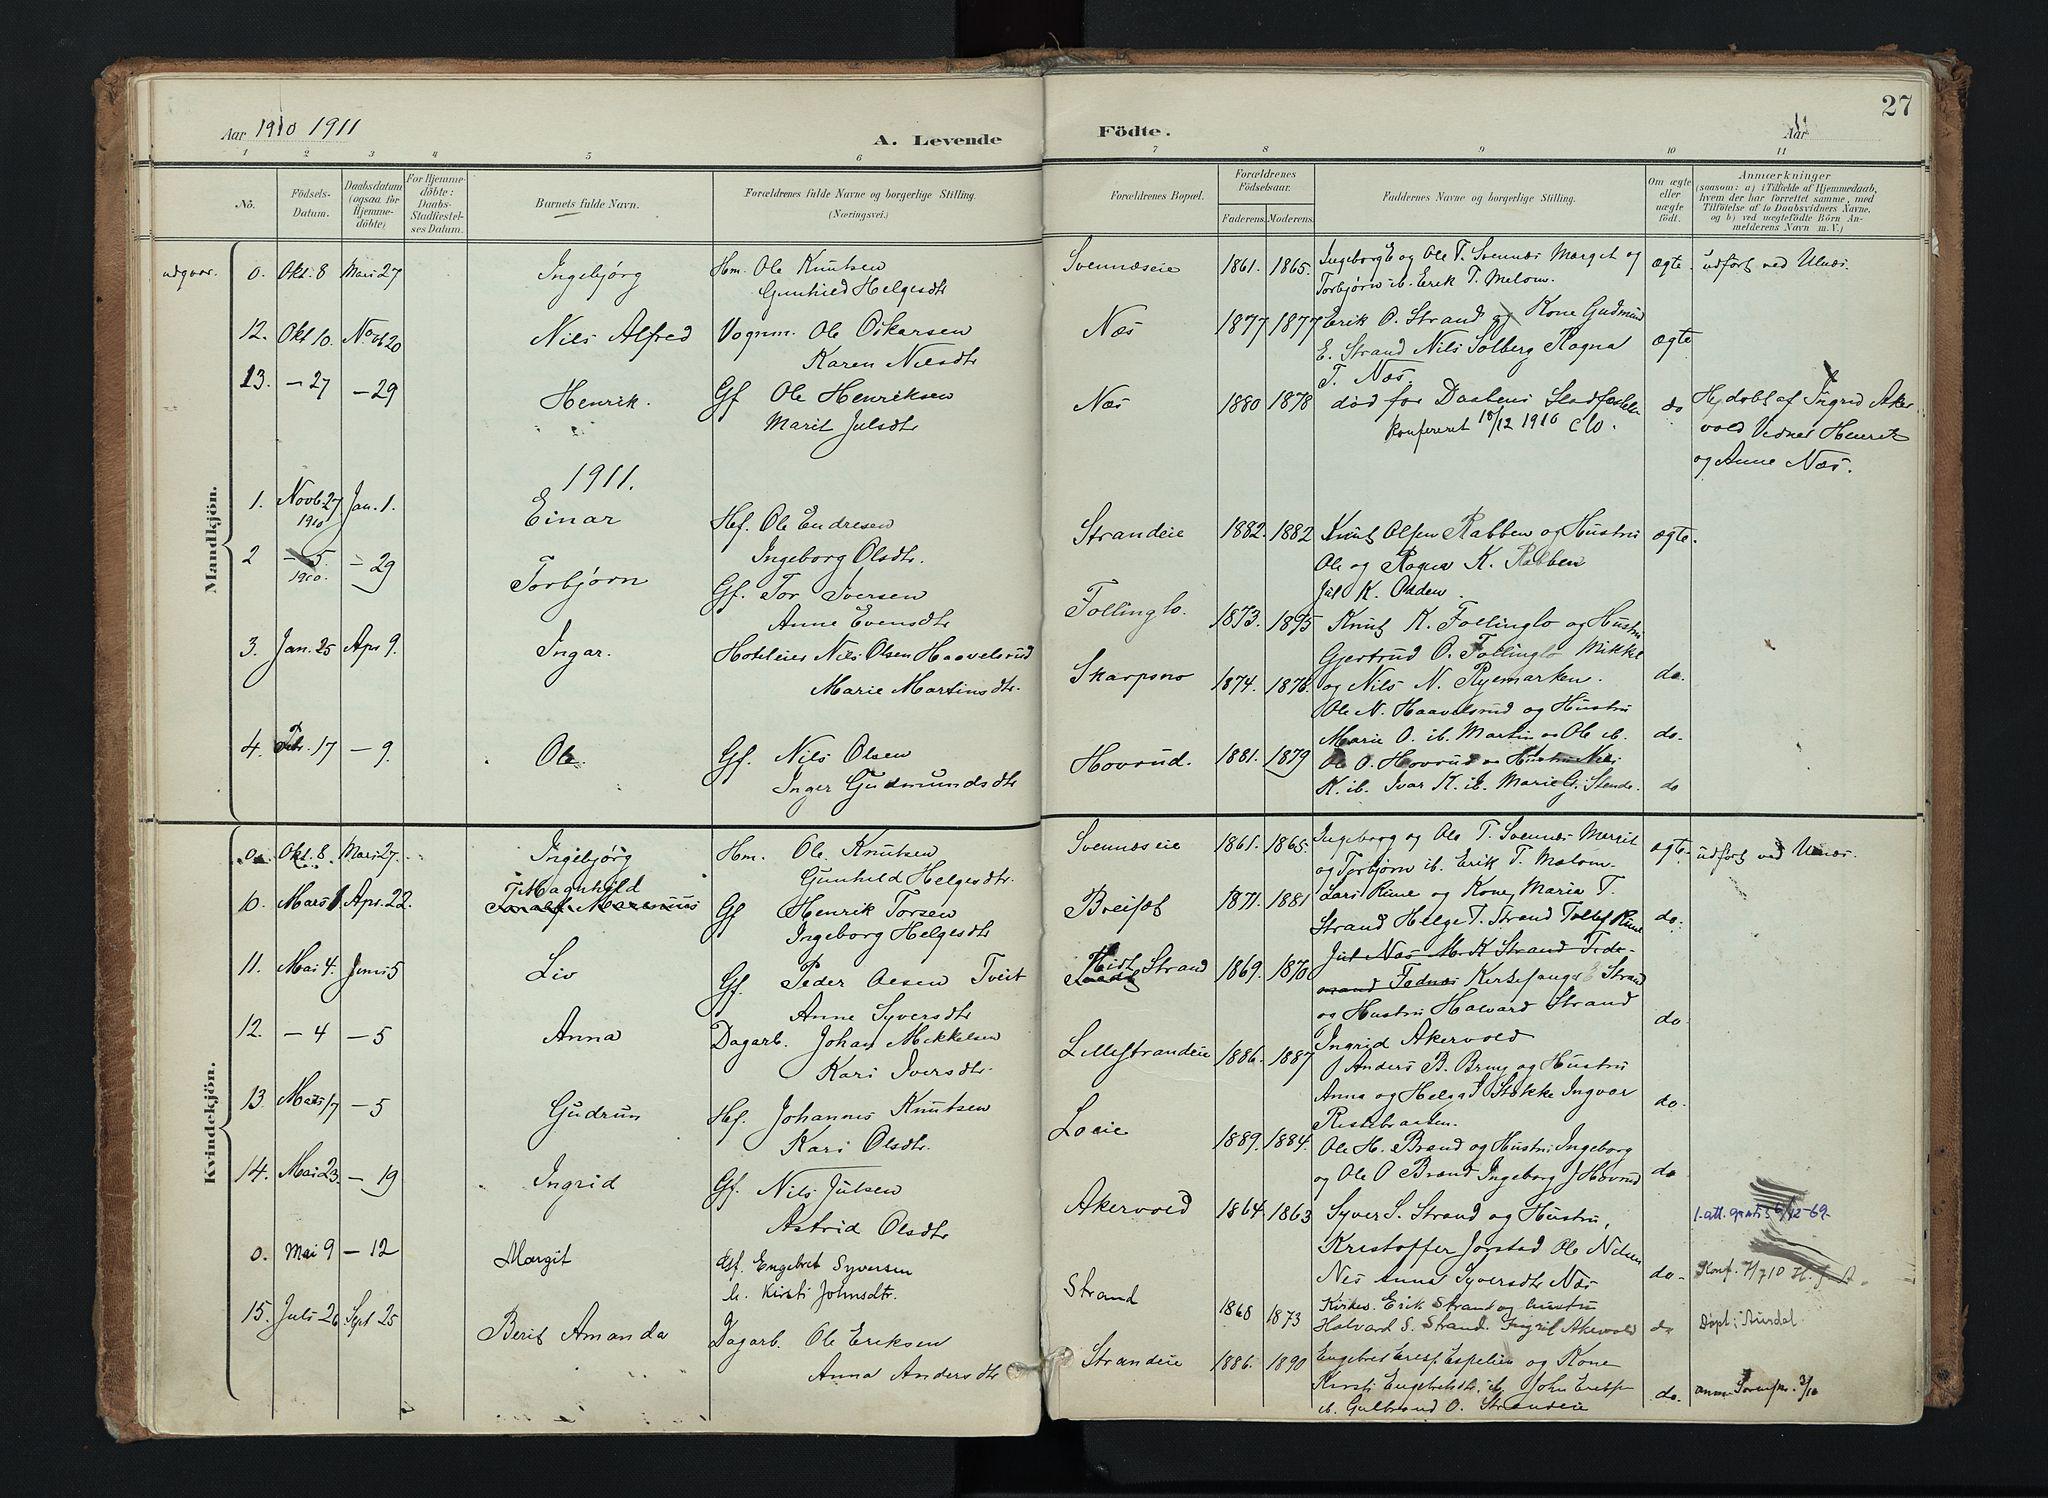 SAH, Nord-Aurdal prestekontor, Ministerialbok nr. 16, 1897-1925, s. 27